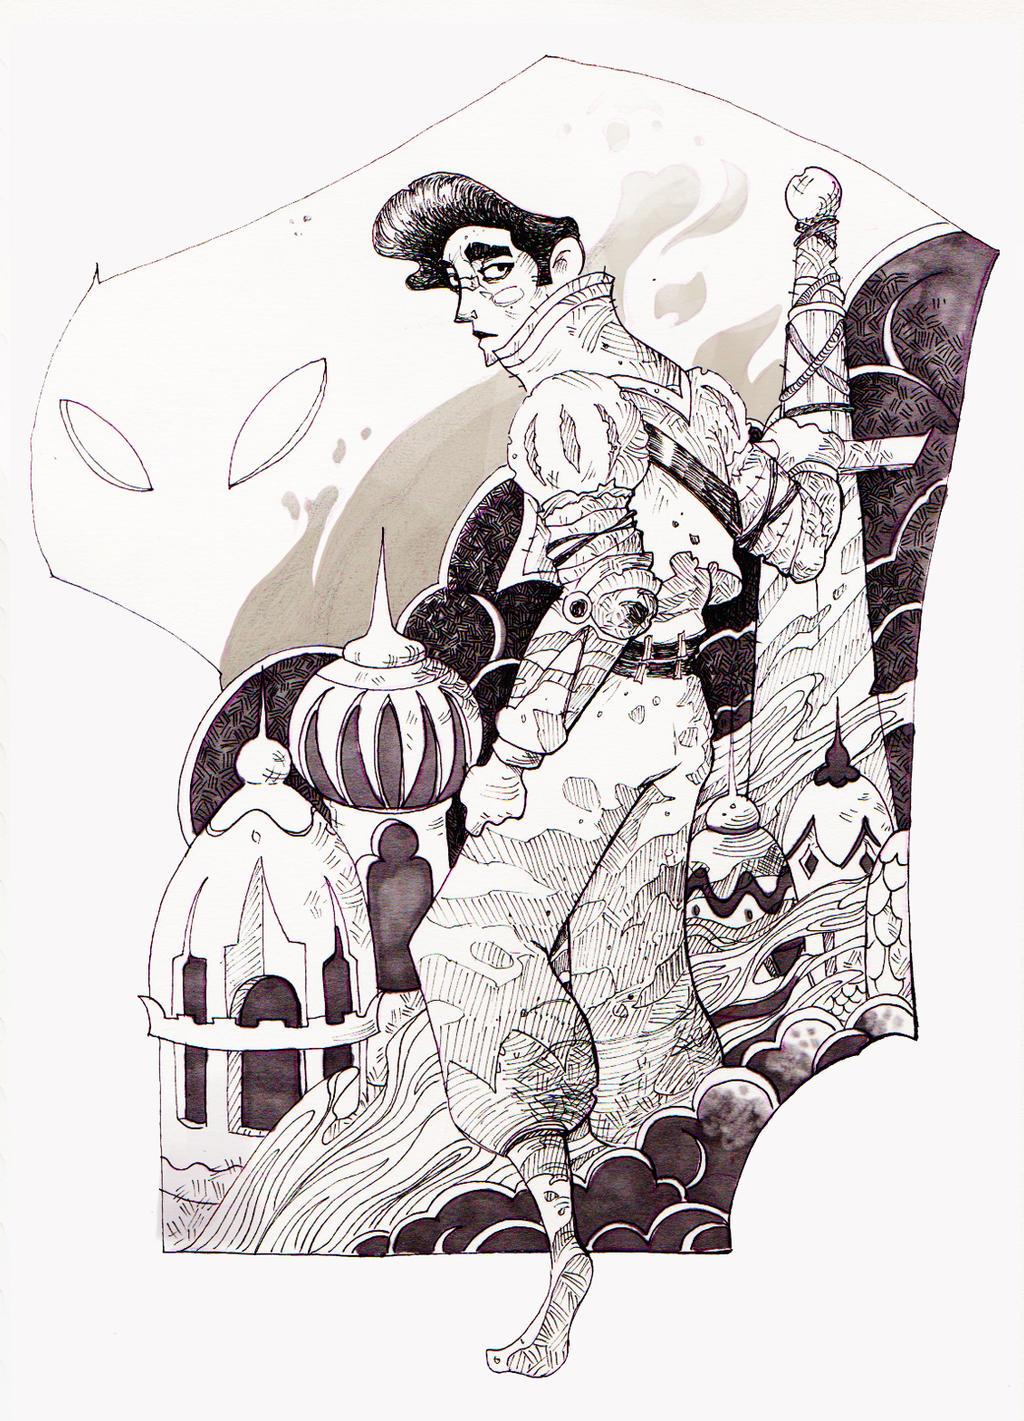 Inktober#3 The Fallen Knight by ApollinArt